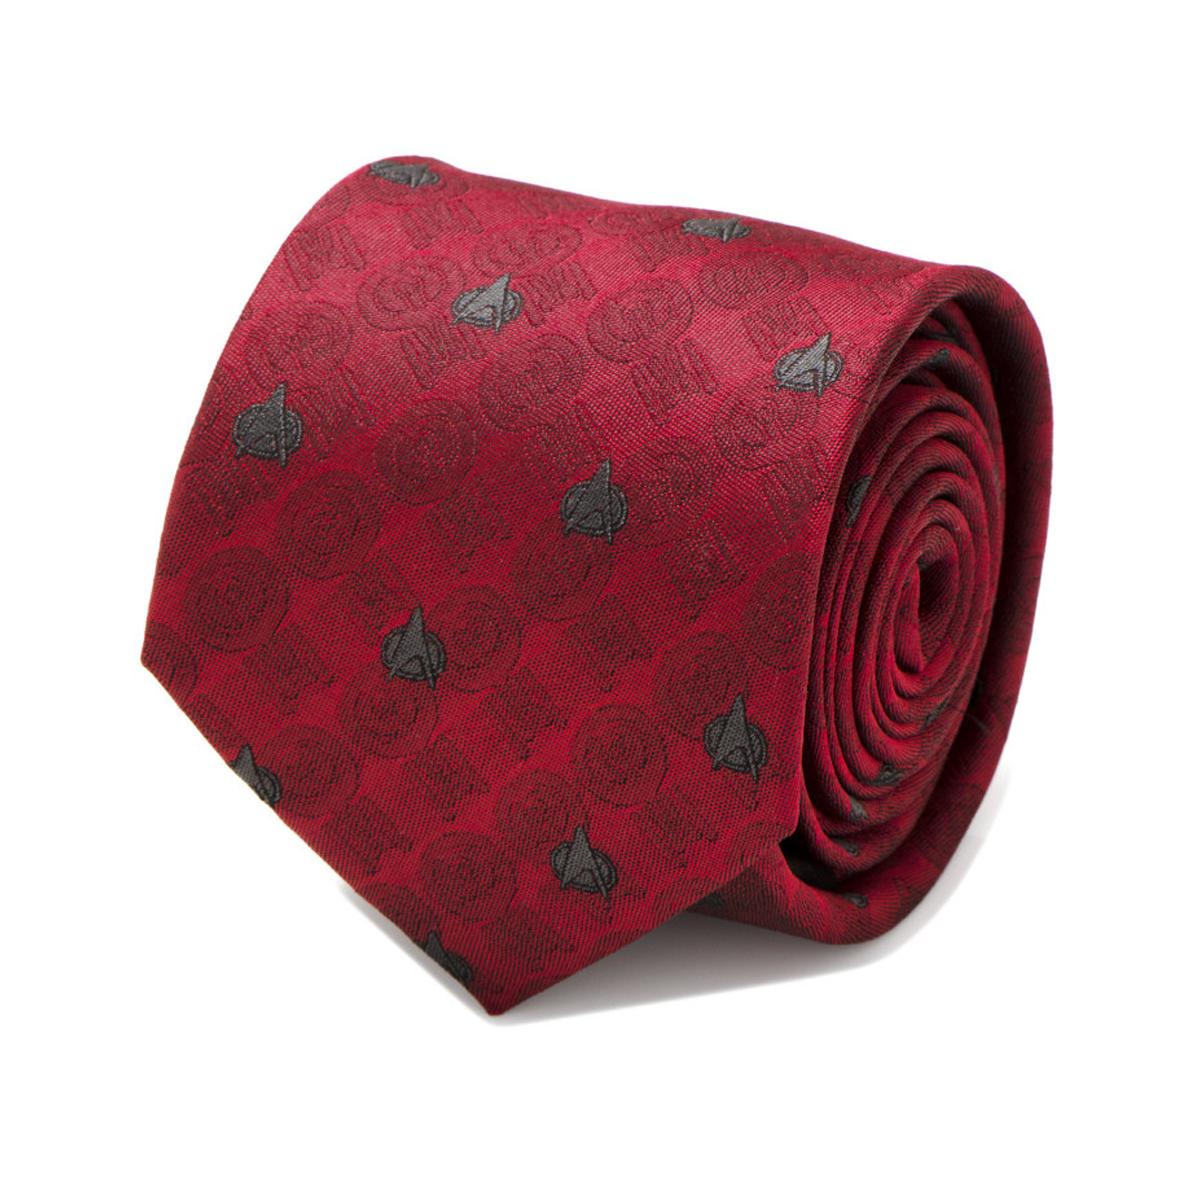 Star Trek The Next Generation Red Delta Men's Tie